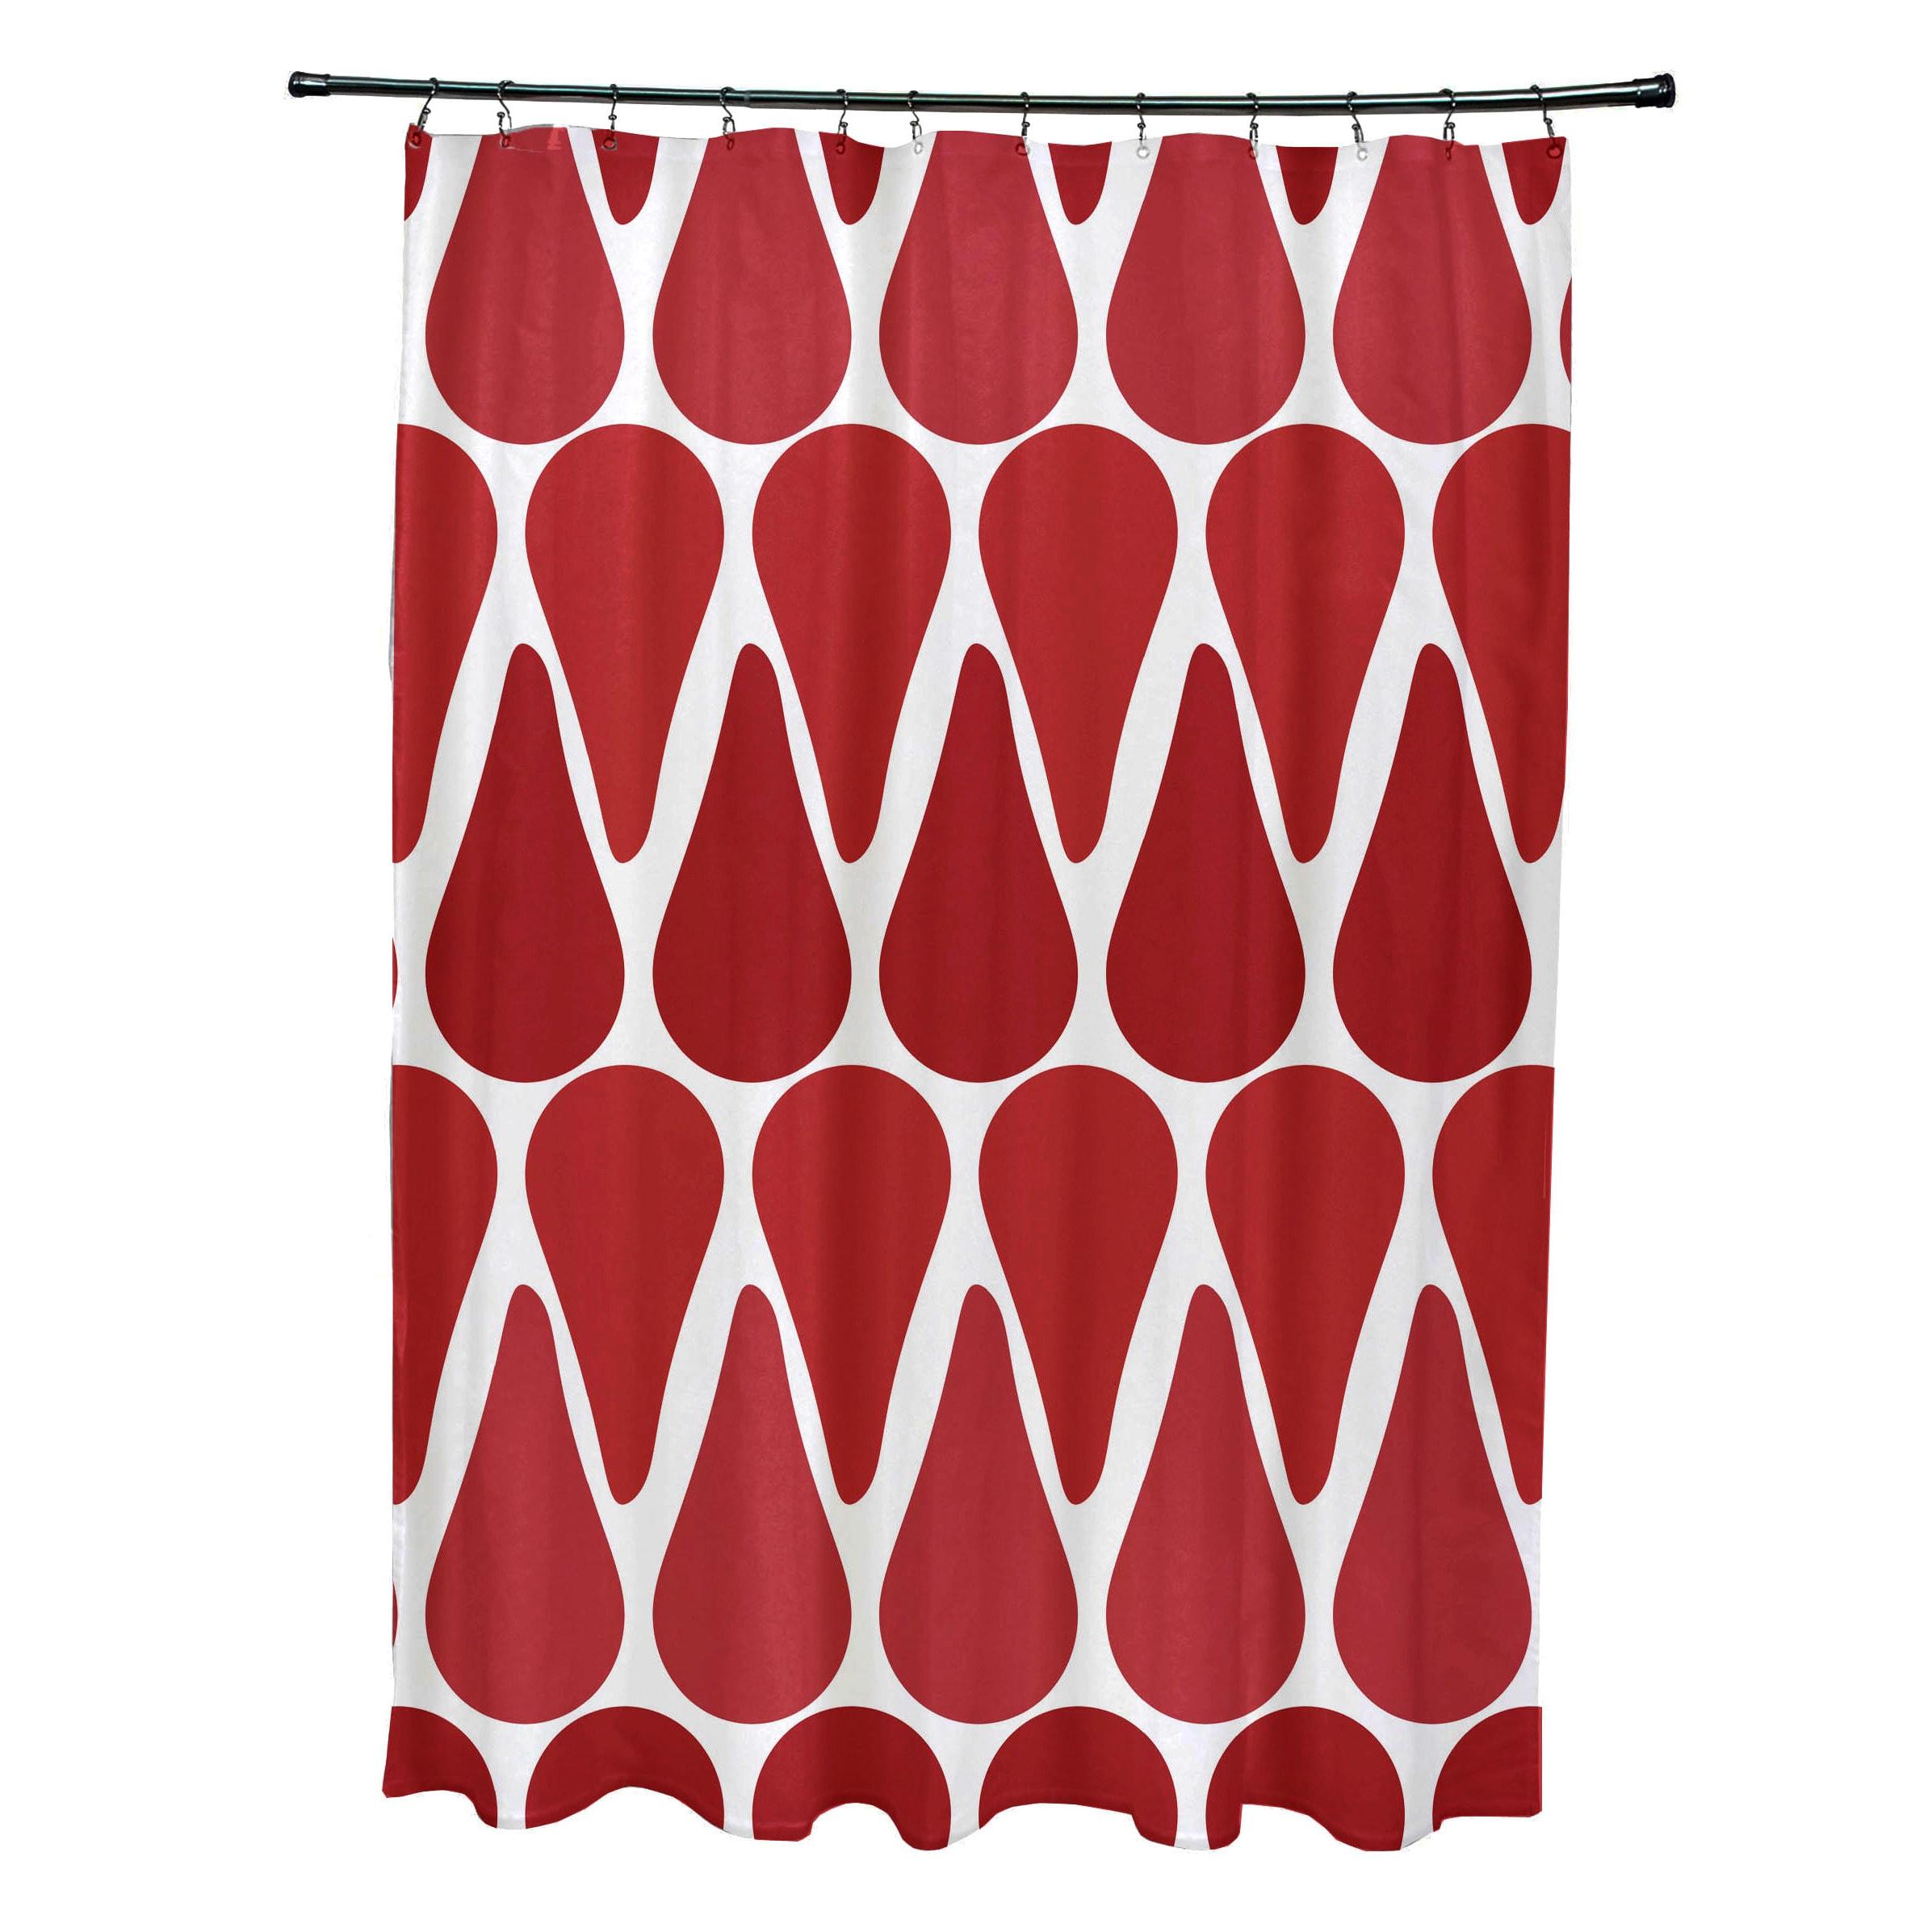 Best 74 Inch Shower Curtain Ideas - Luxurious Bathtub Ideas and ...